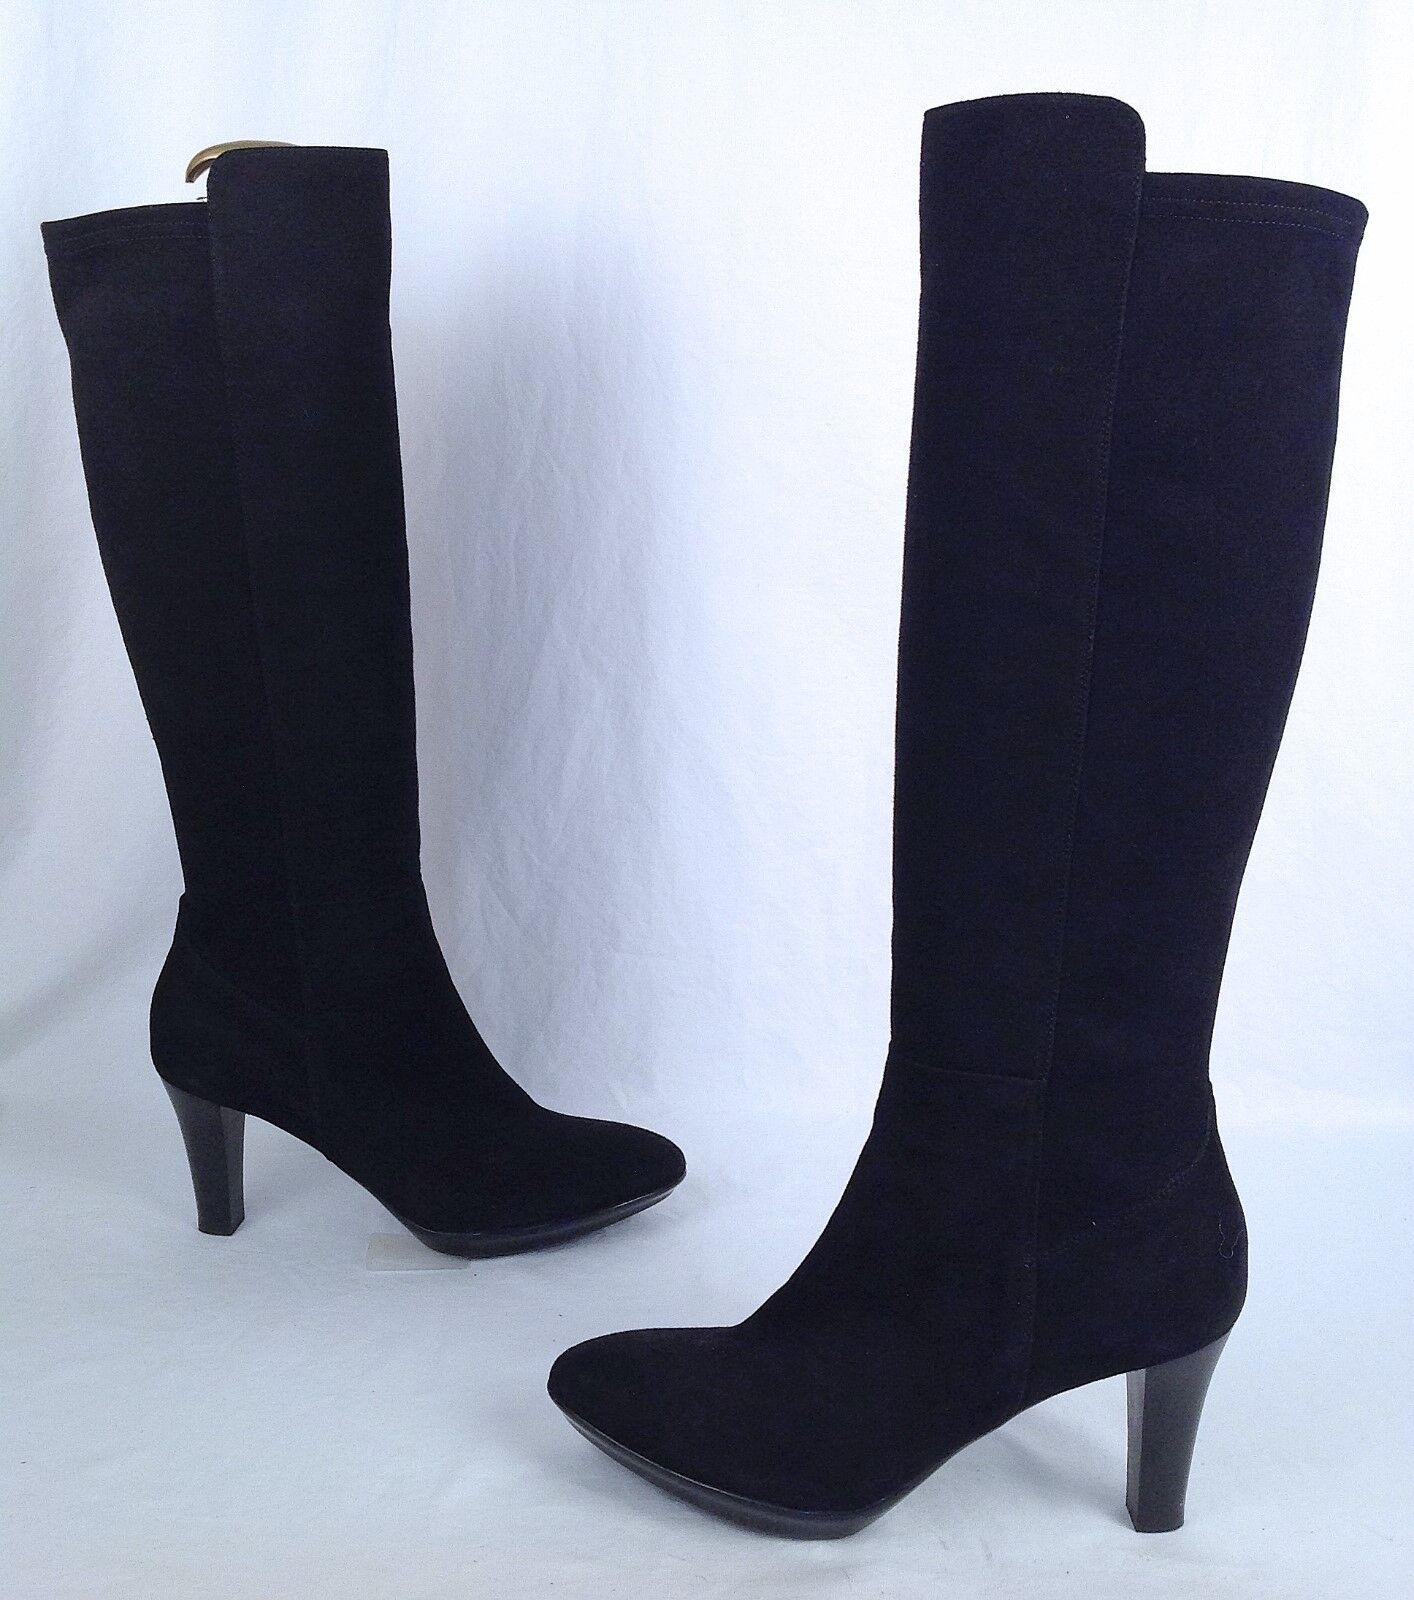 New   Aquatalia- 'Raine' Weatherproof Tall Boots-Size 9.5 M-  650 (B73)